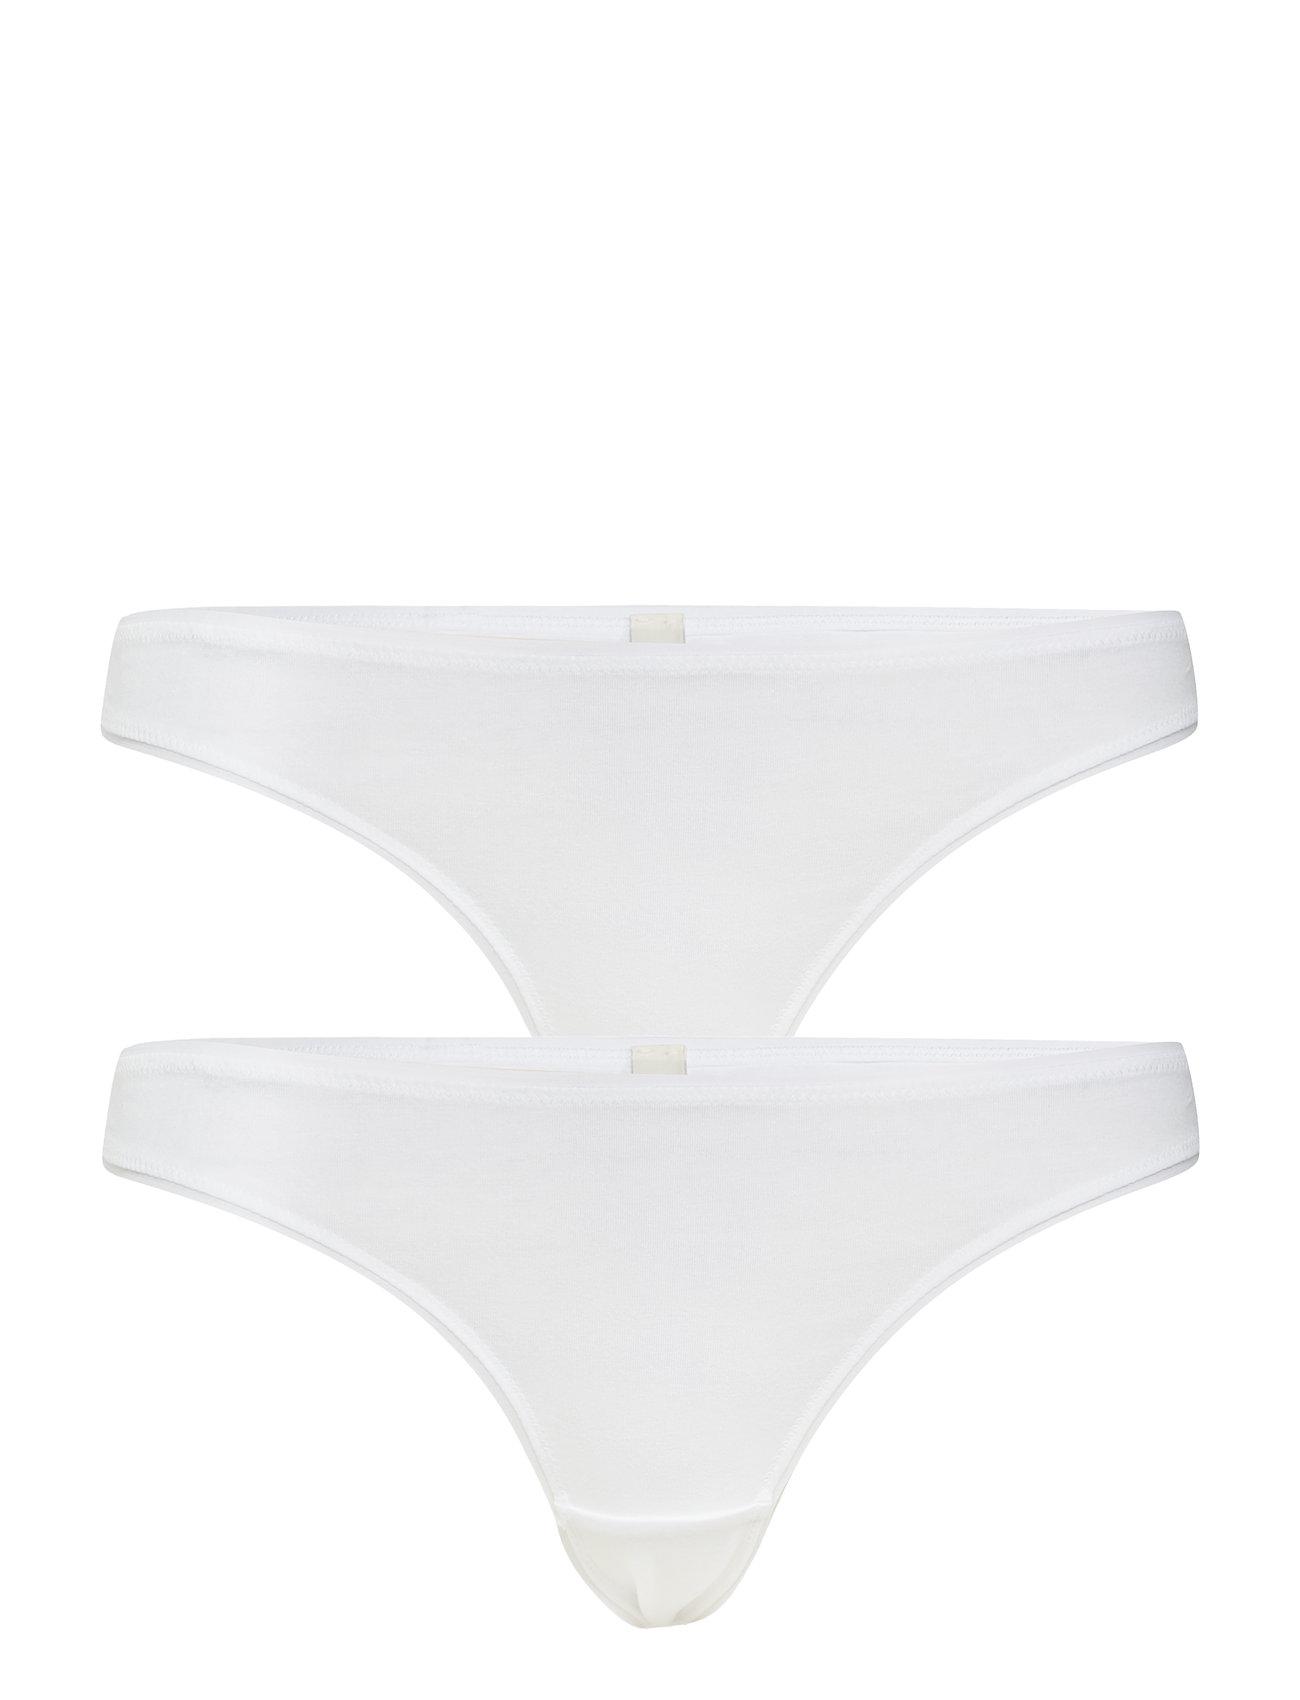 Esprit Bodywear Women Bottoms - WHITE